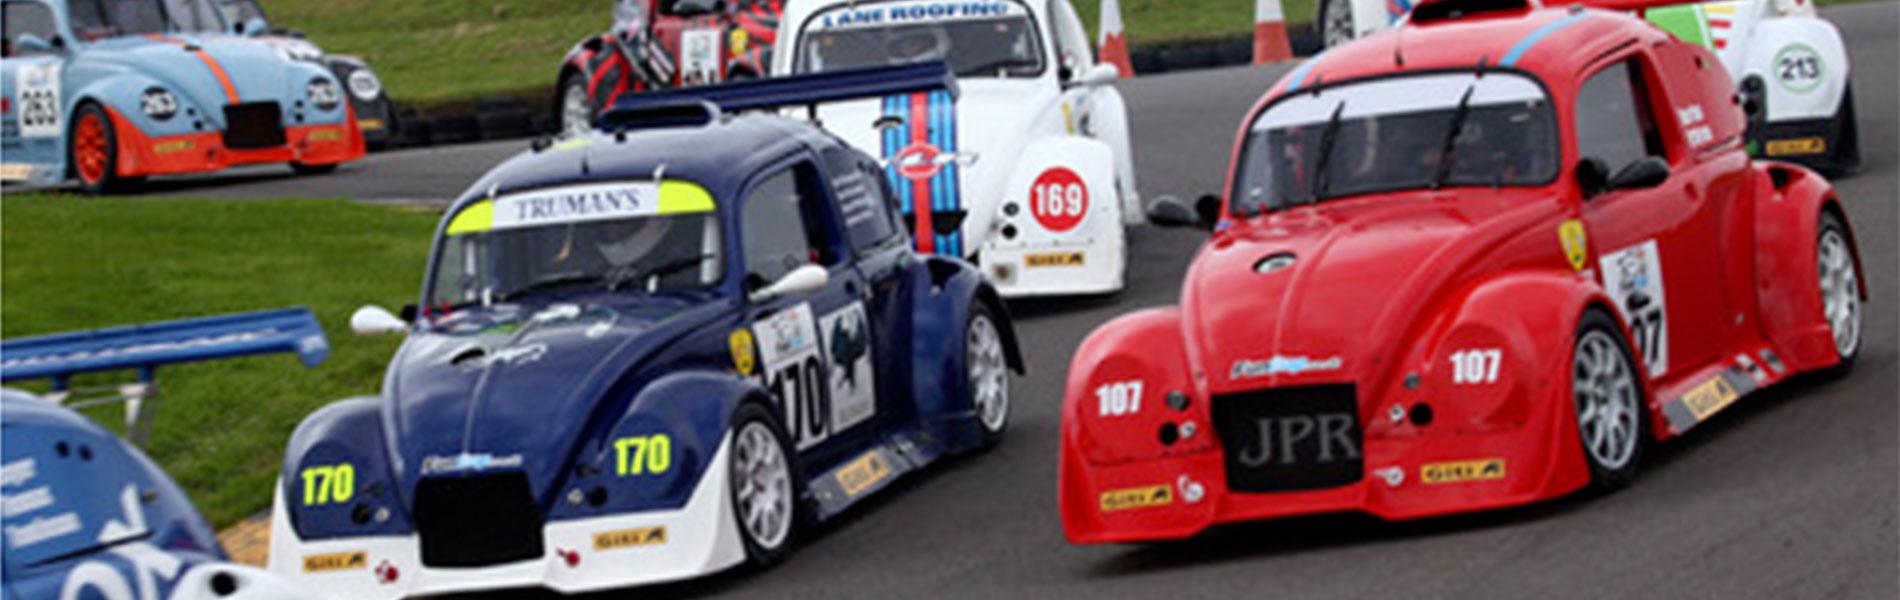 final-fun-at-oulton-park-motorsportdays-track-days-1